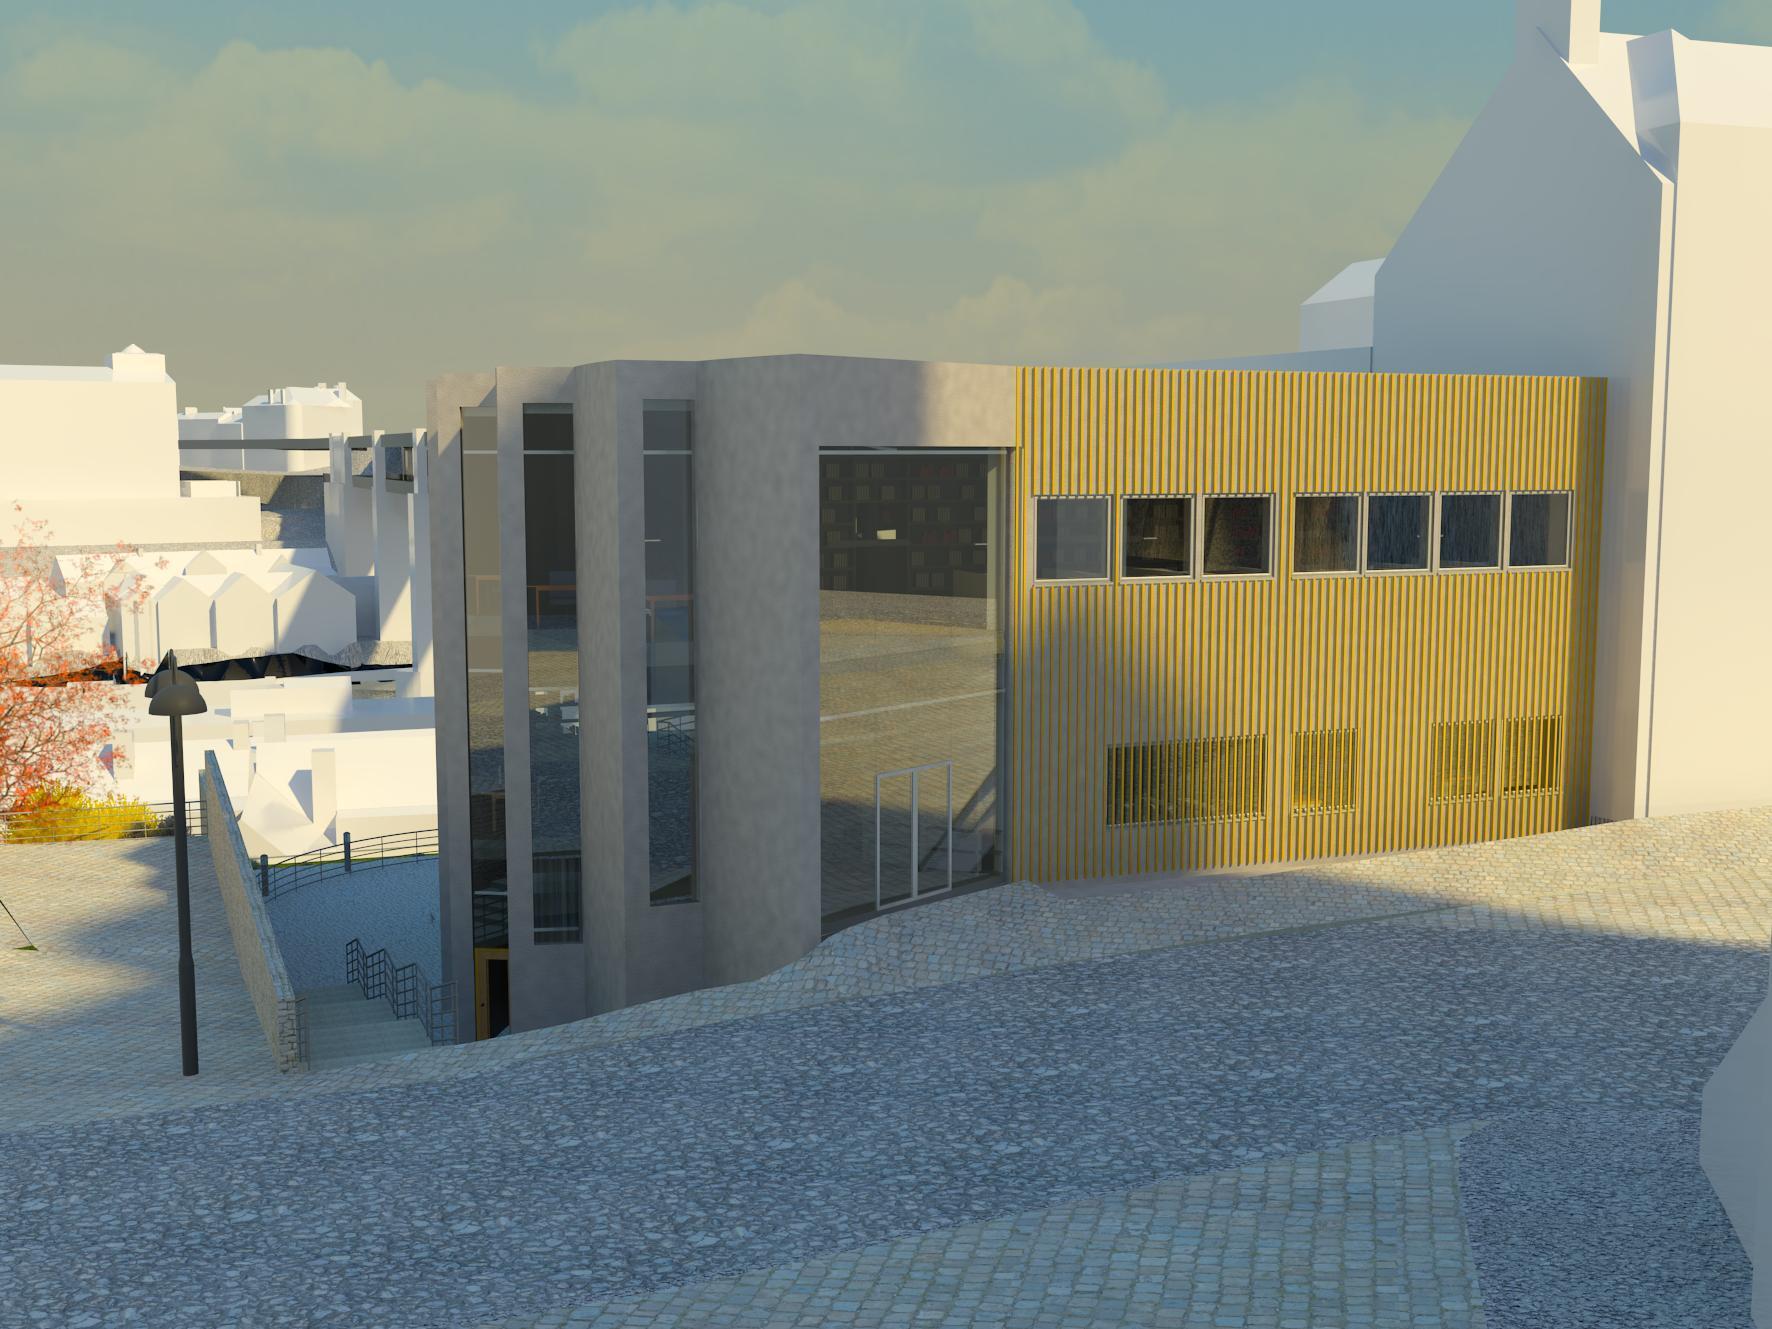 RT @DanielJWright01: An external render of the north-facing façade of my building.  @campusBIM #BIM #REVIT http://t.co/3aojK7CuCe